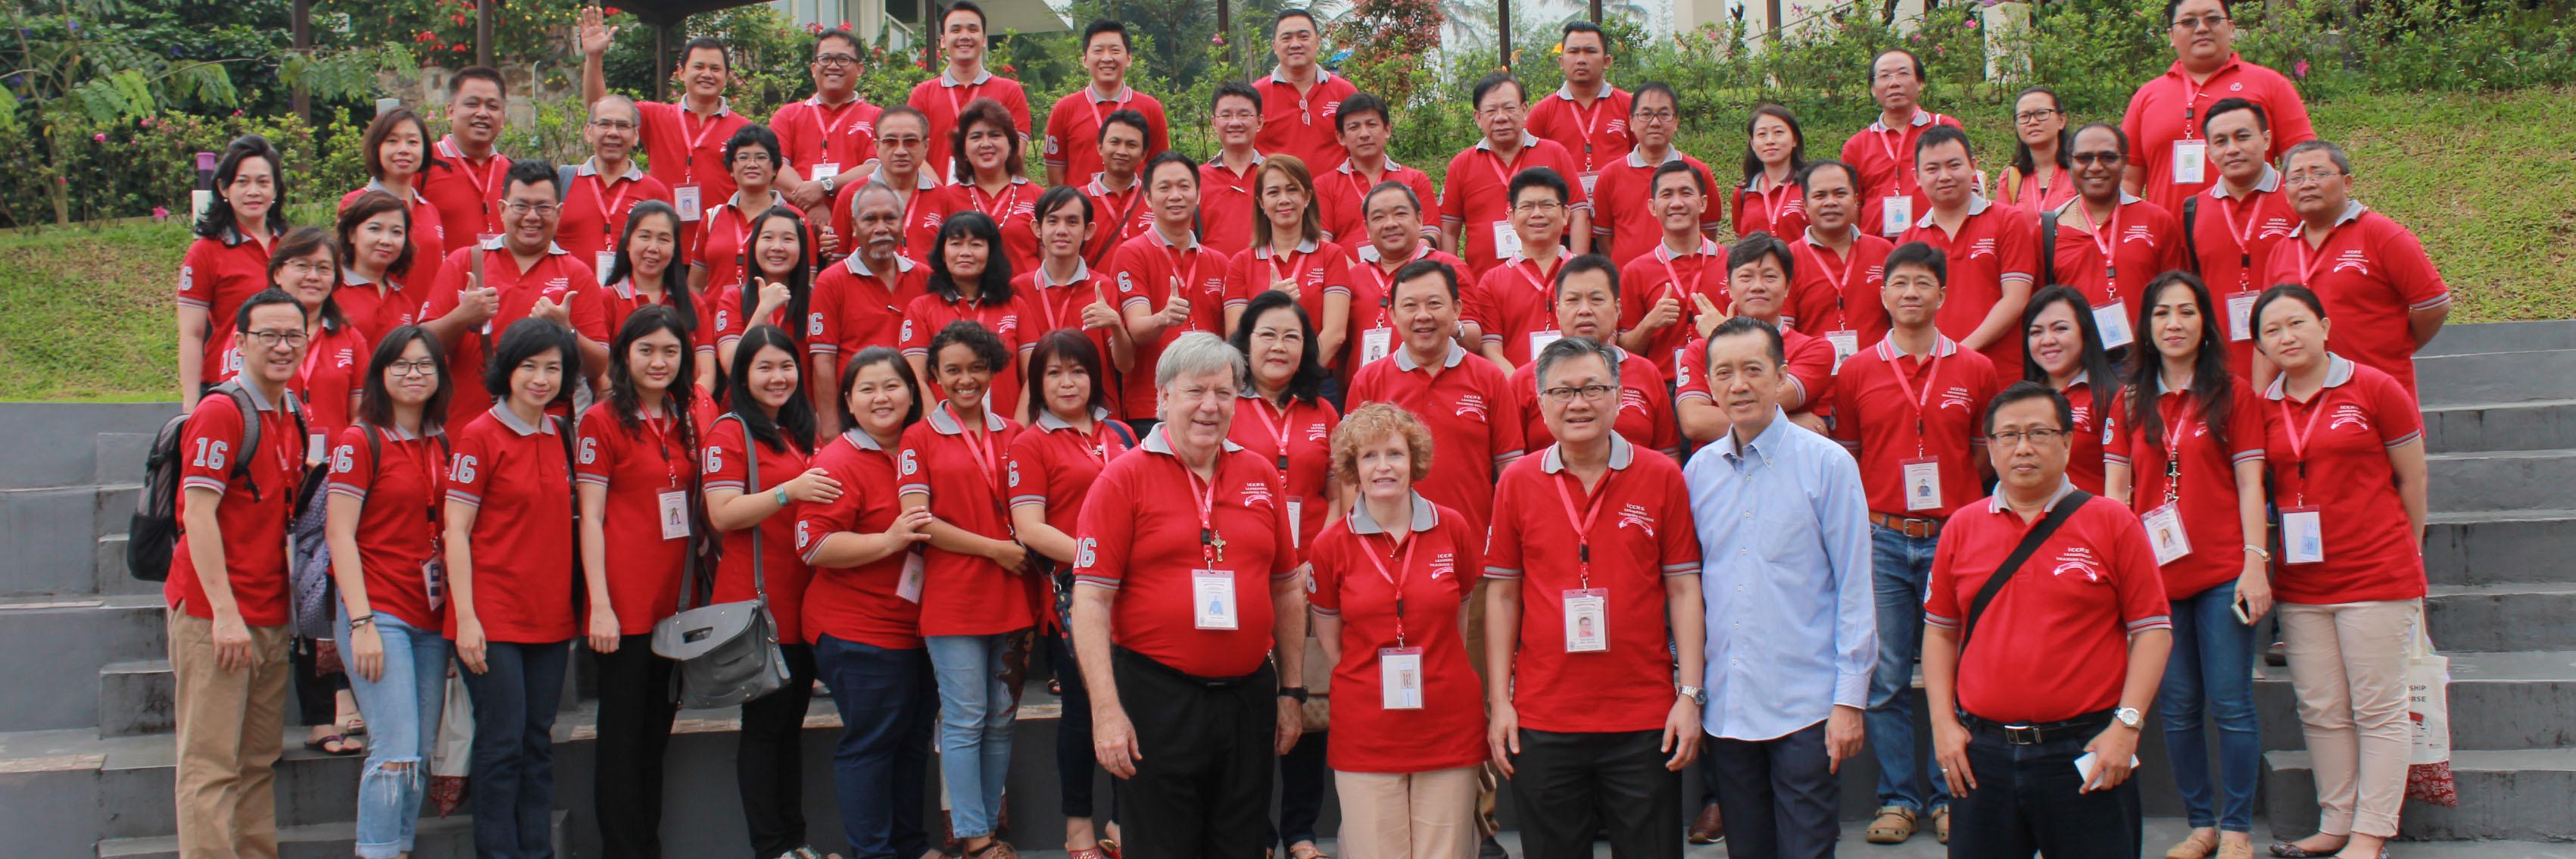 ICCRS LTC Indonesia Villa Bukit Pancawati 22 Feb - 01 Maret 2016